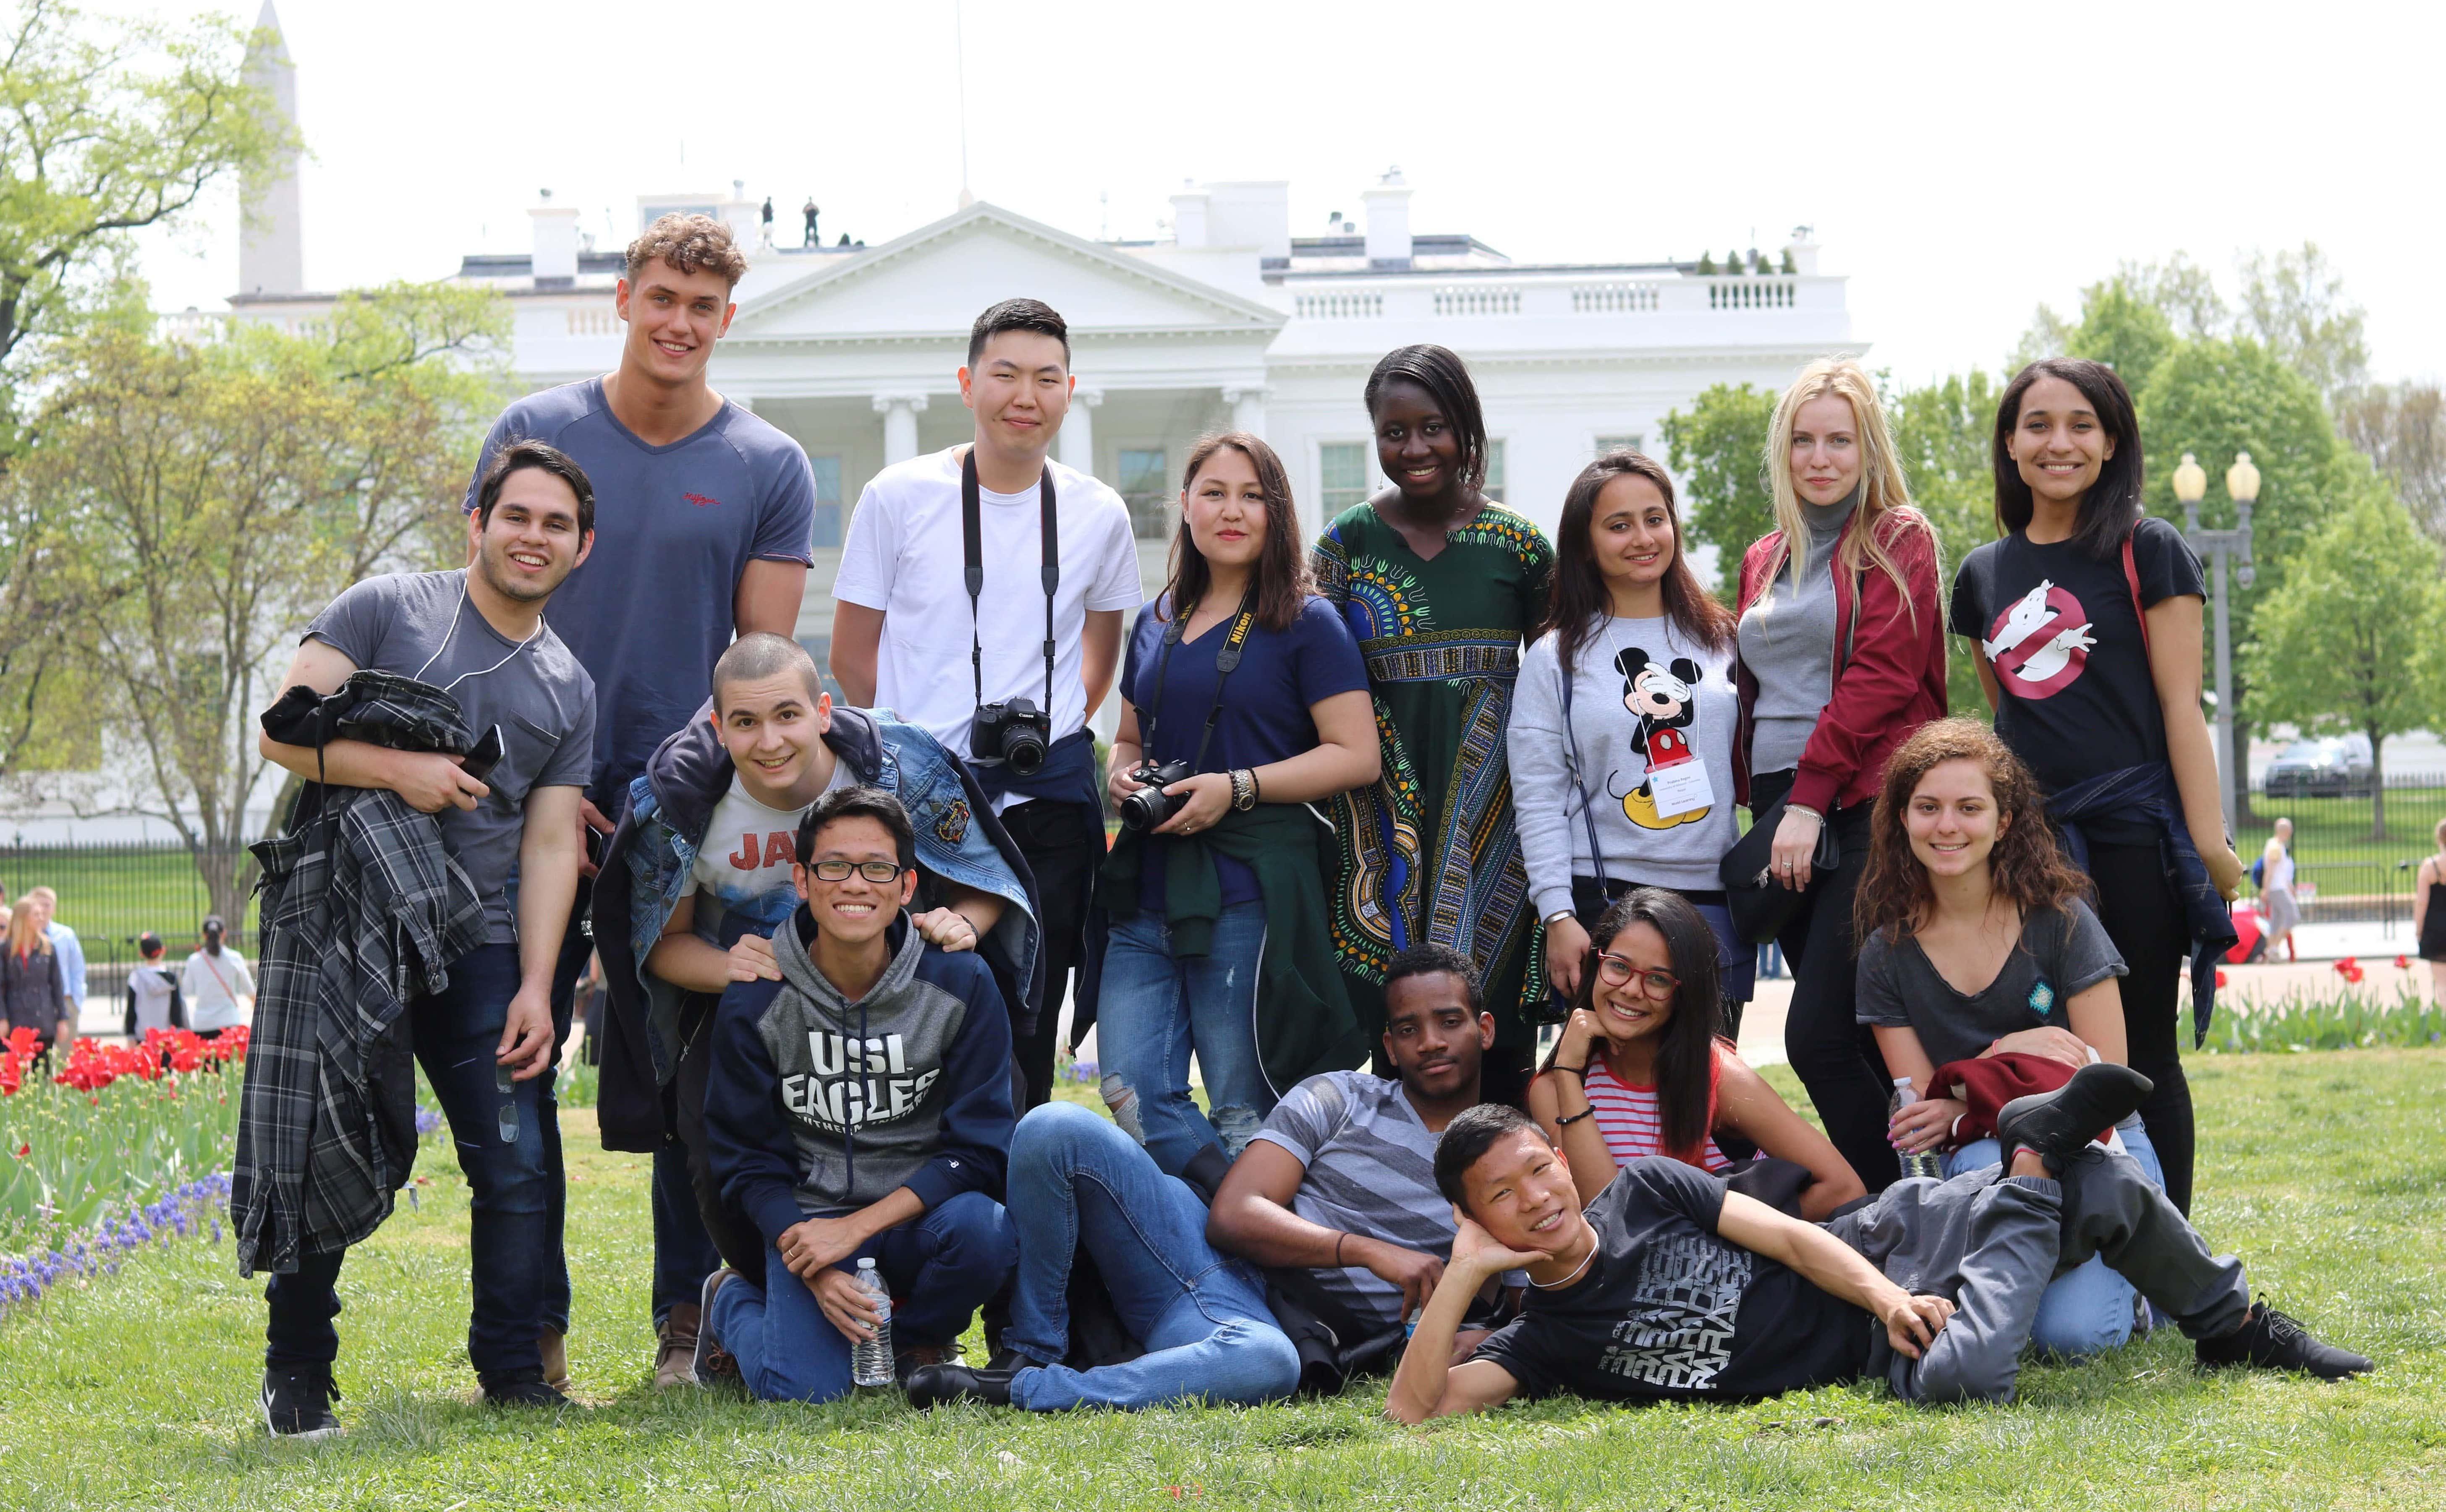 Global Undergraduate Exchange Program in the United States 2019/2020